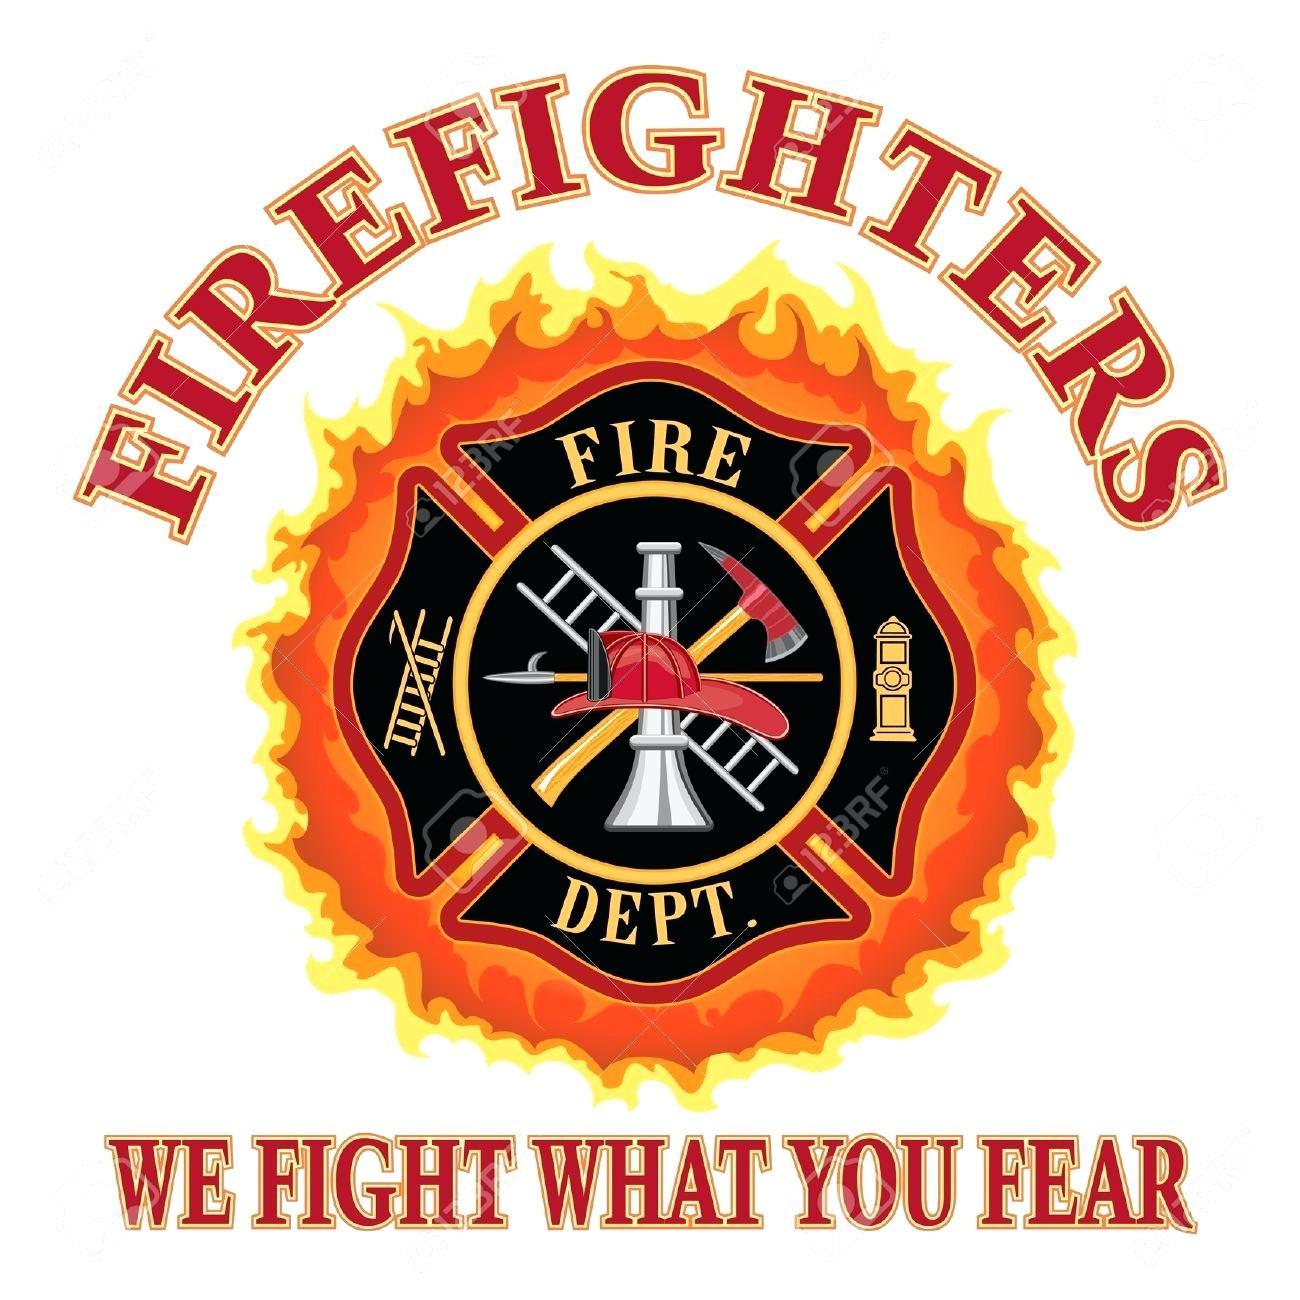 Calgary Fire Department Wikipedia